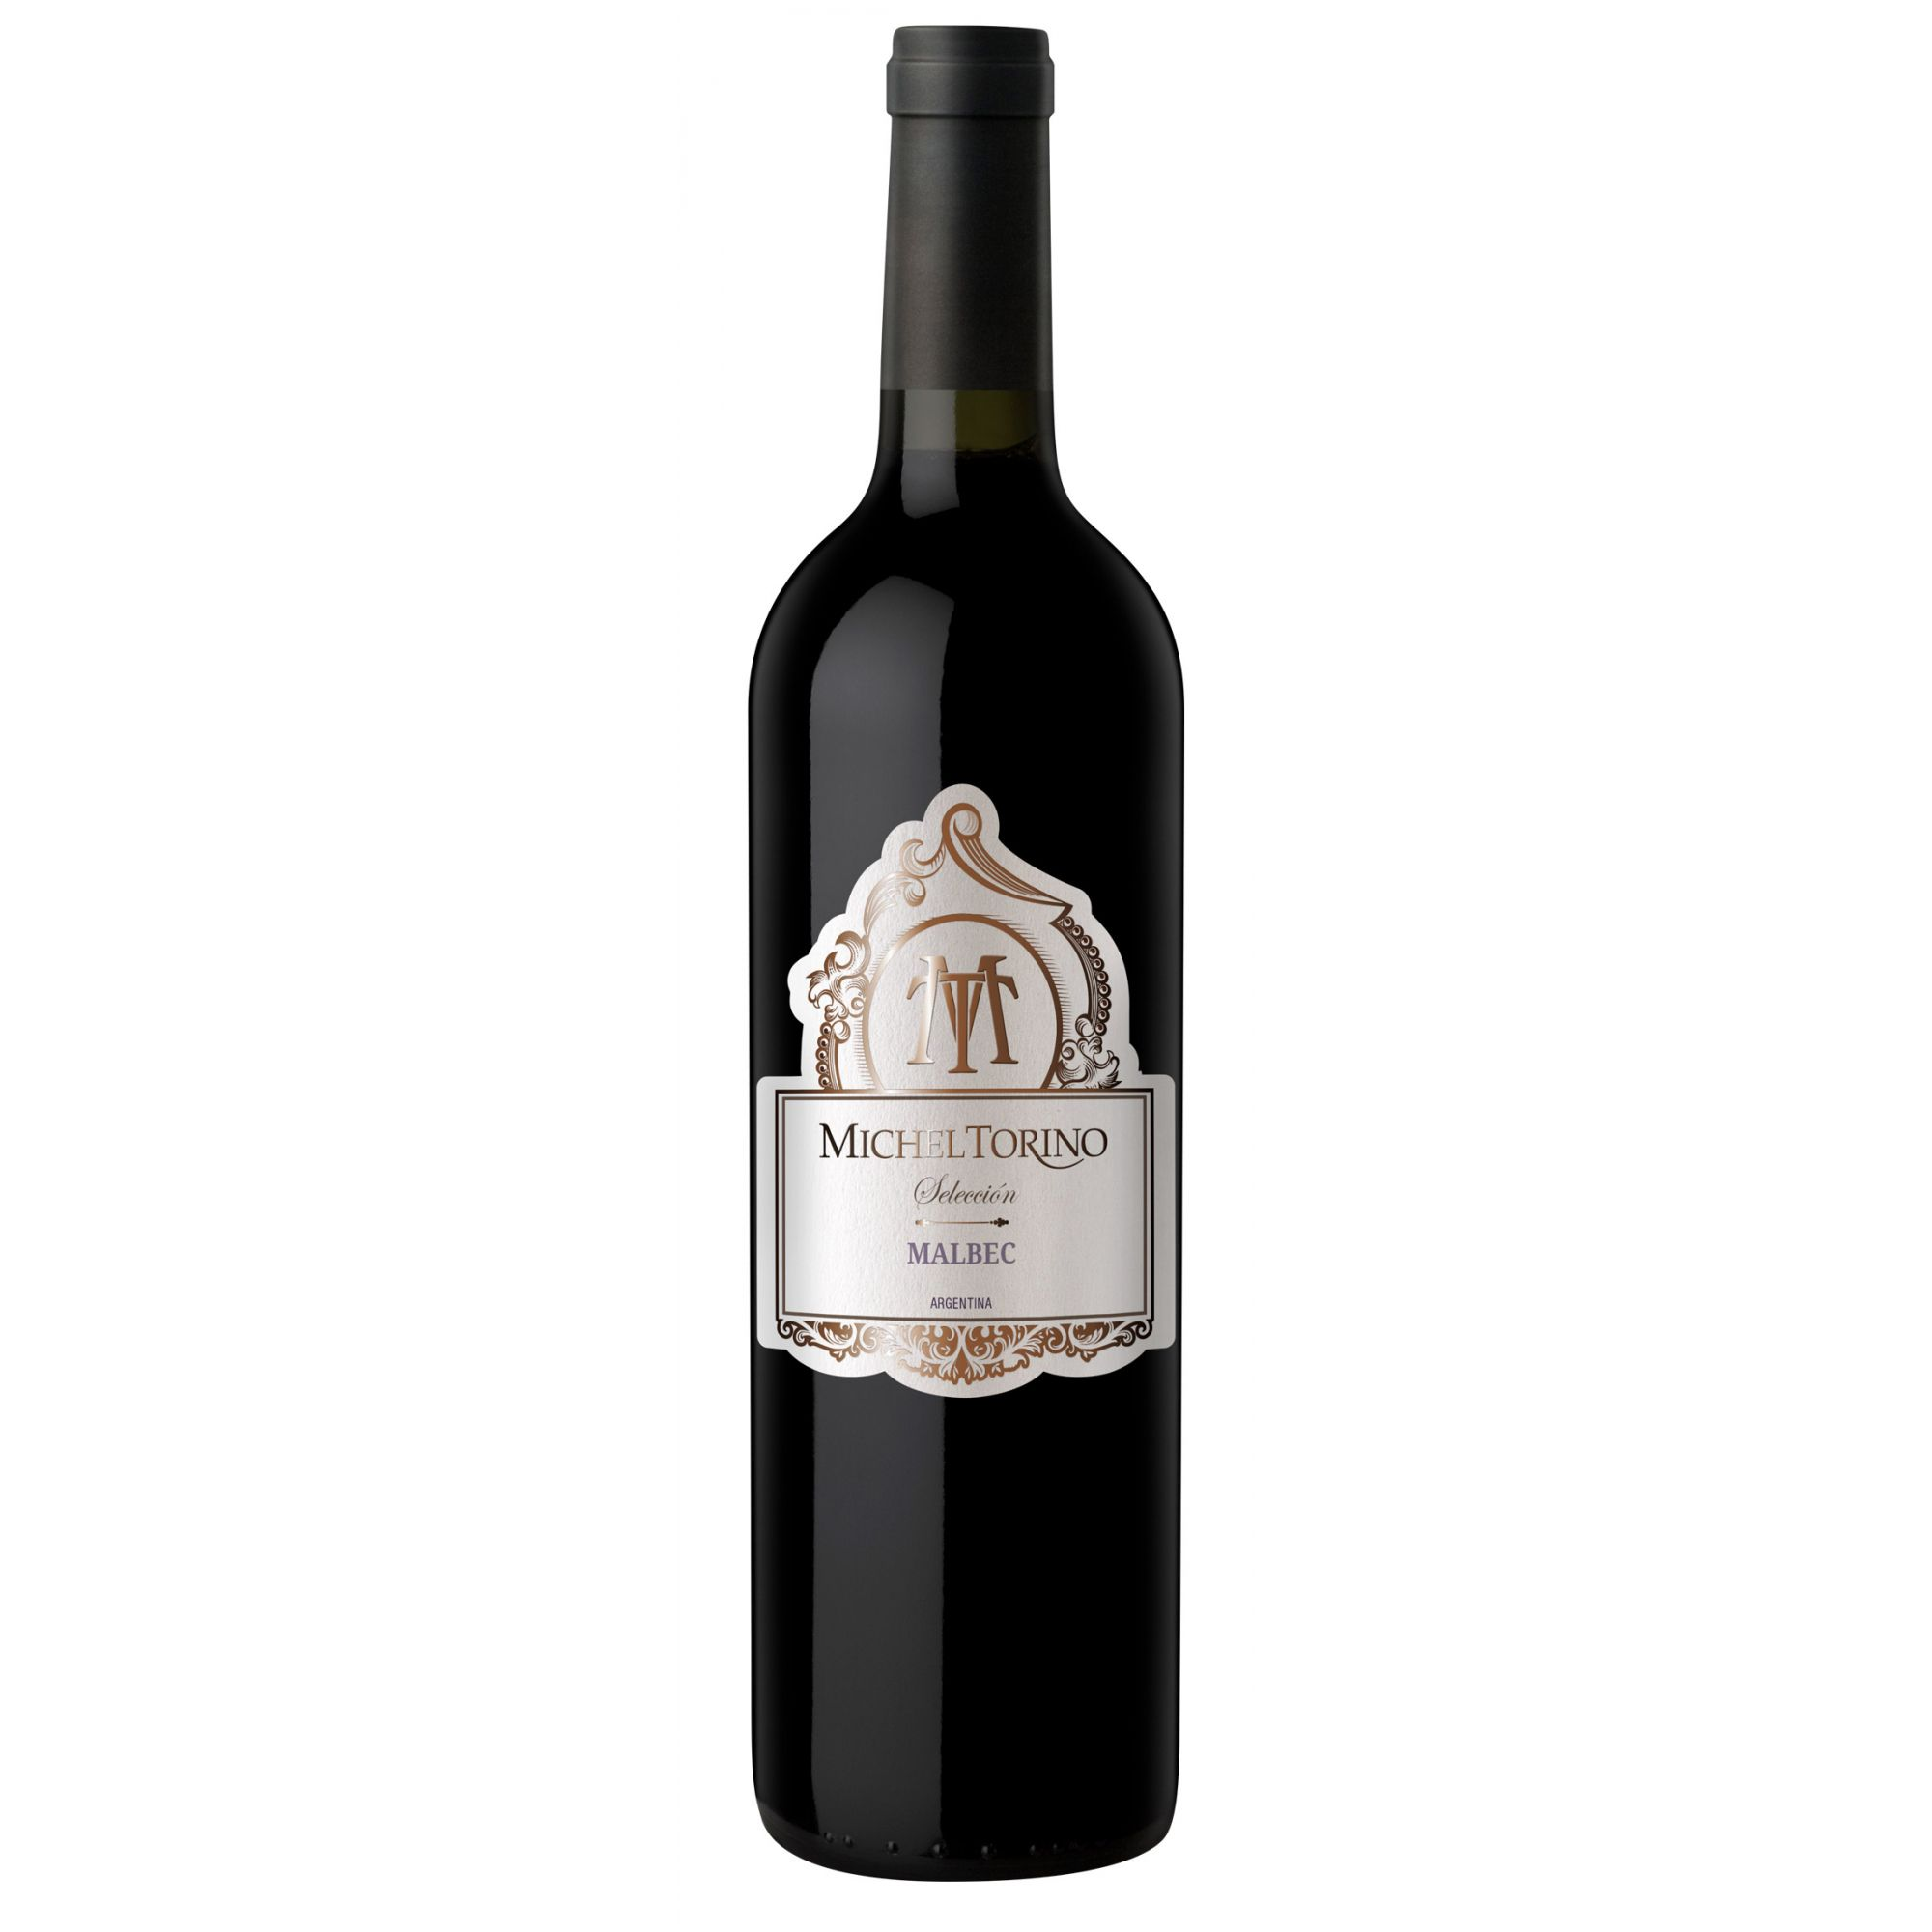 Vinho Argentino Michel Torino Collection Malbec 2018 (750ml)